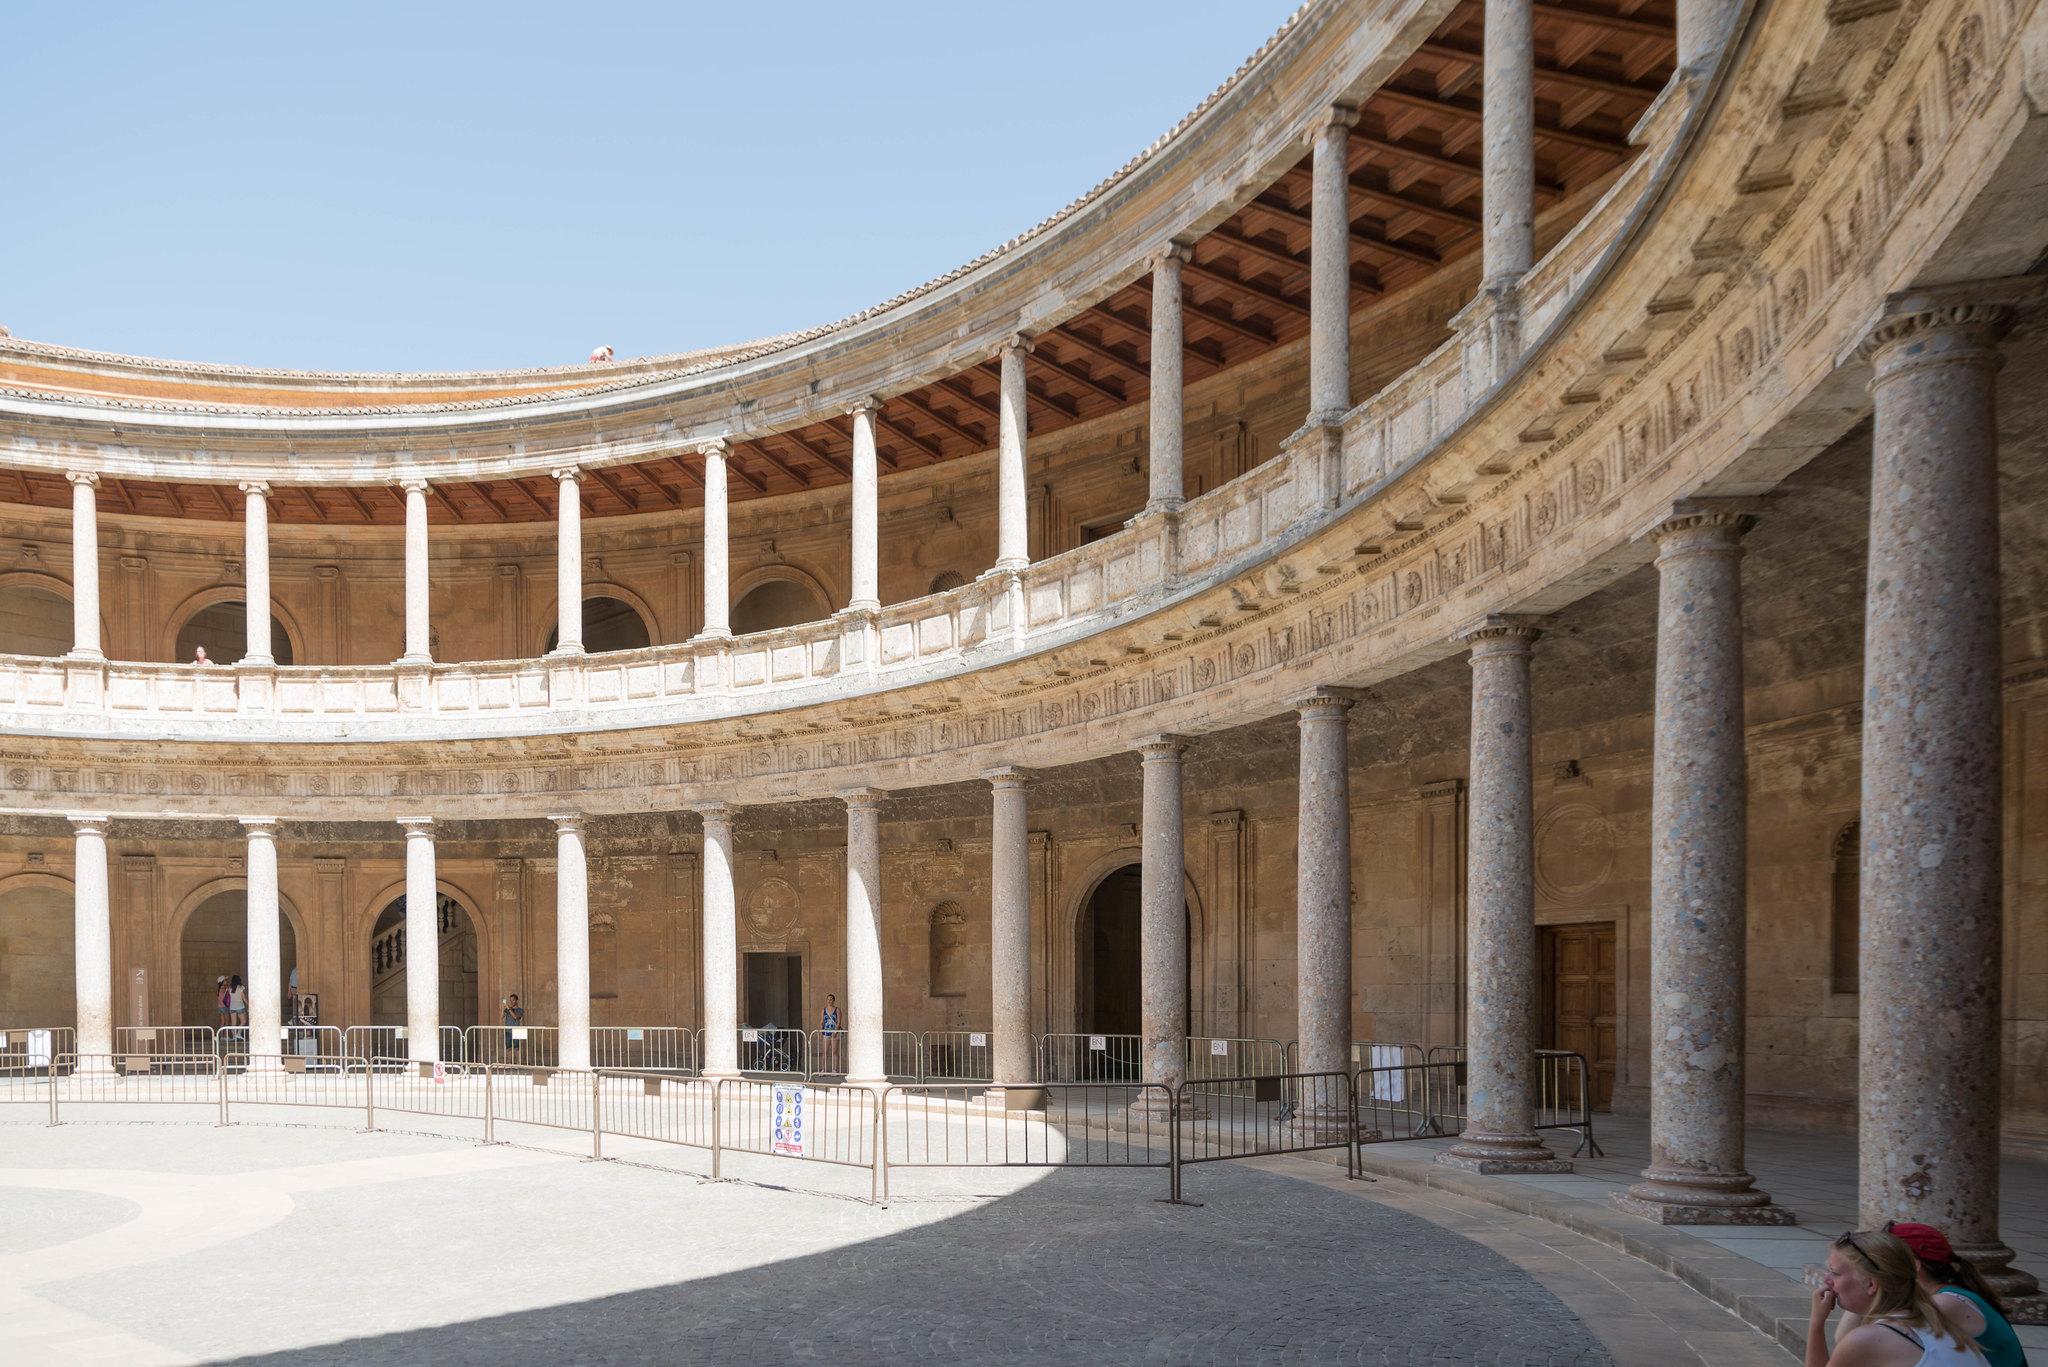 Alhambra Granada Spain curves